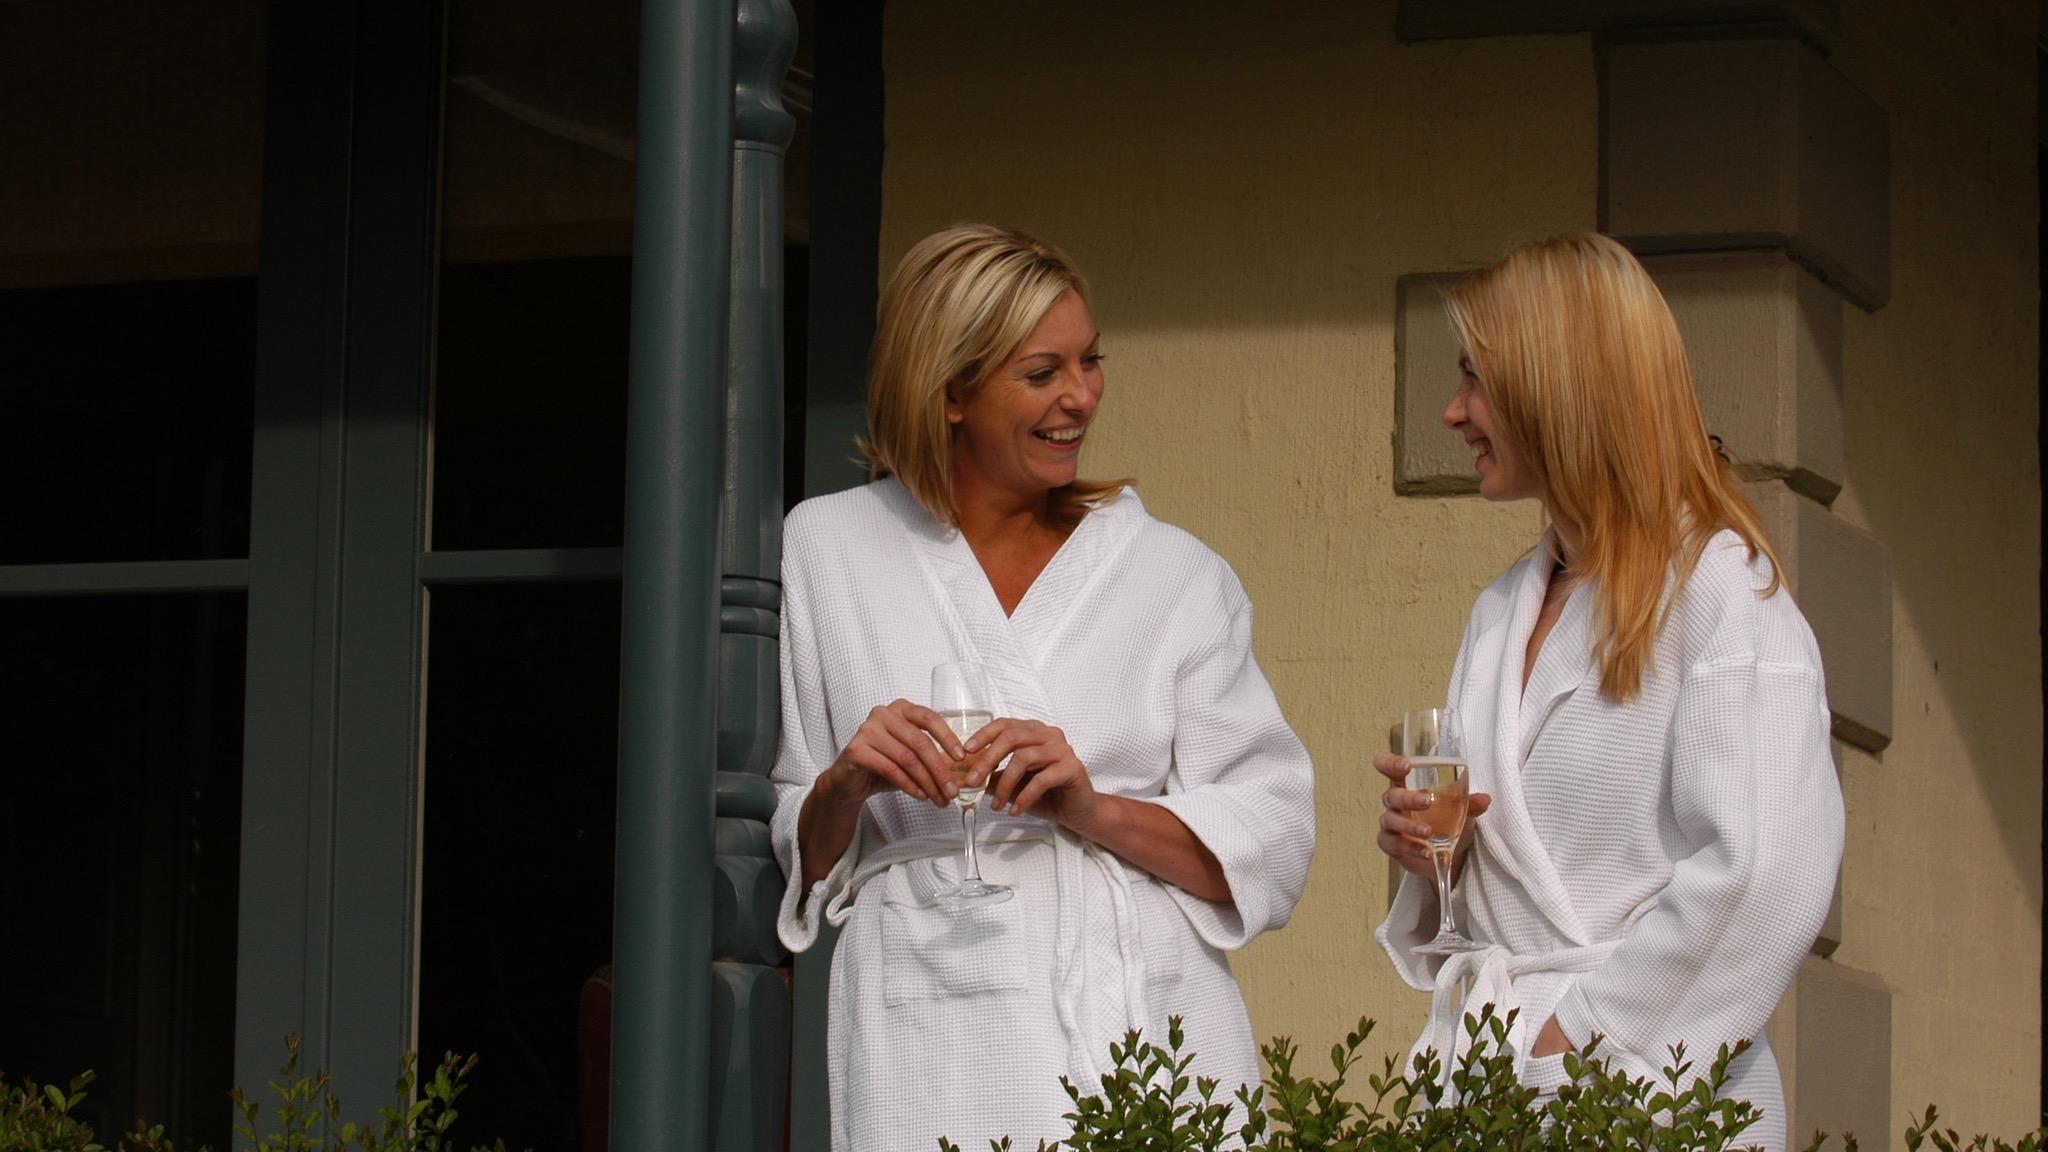 Woodman Estate - Two Ladies at Wellness Retreat